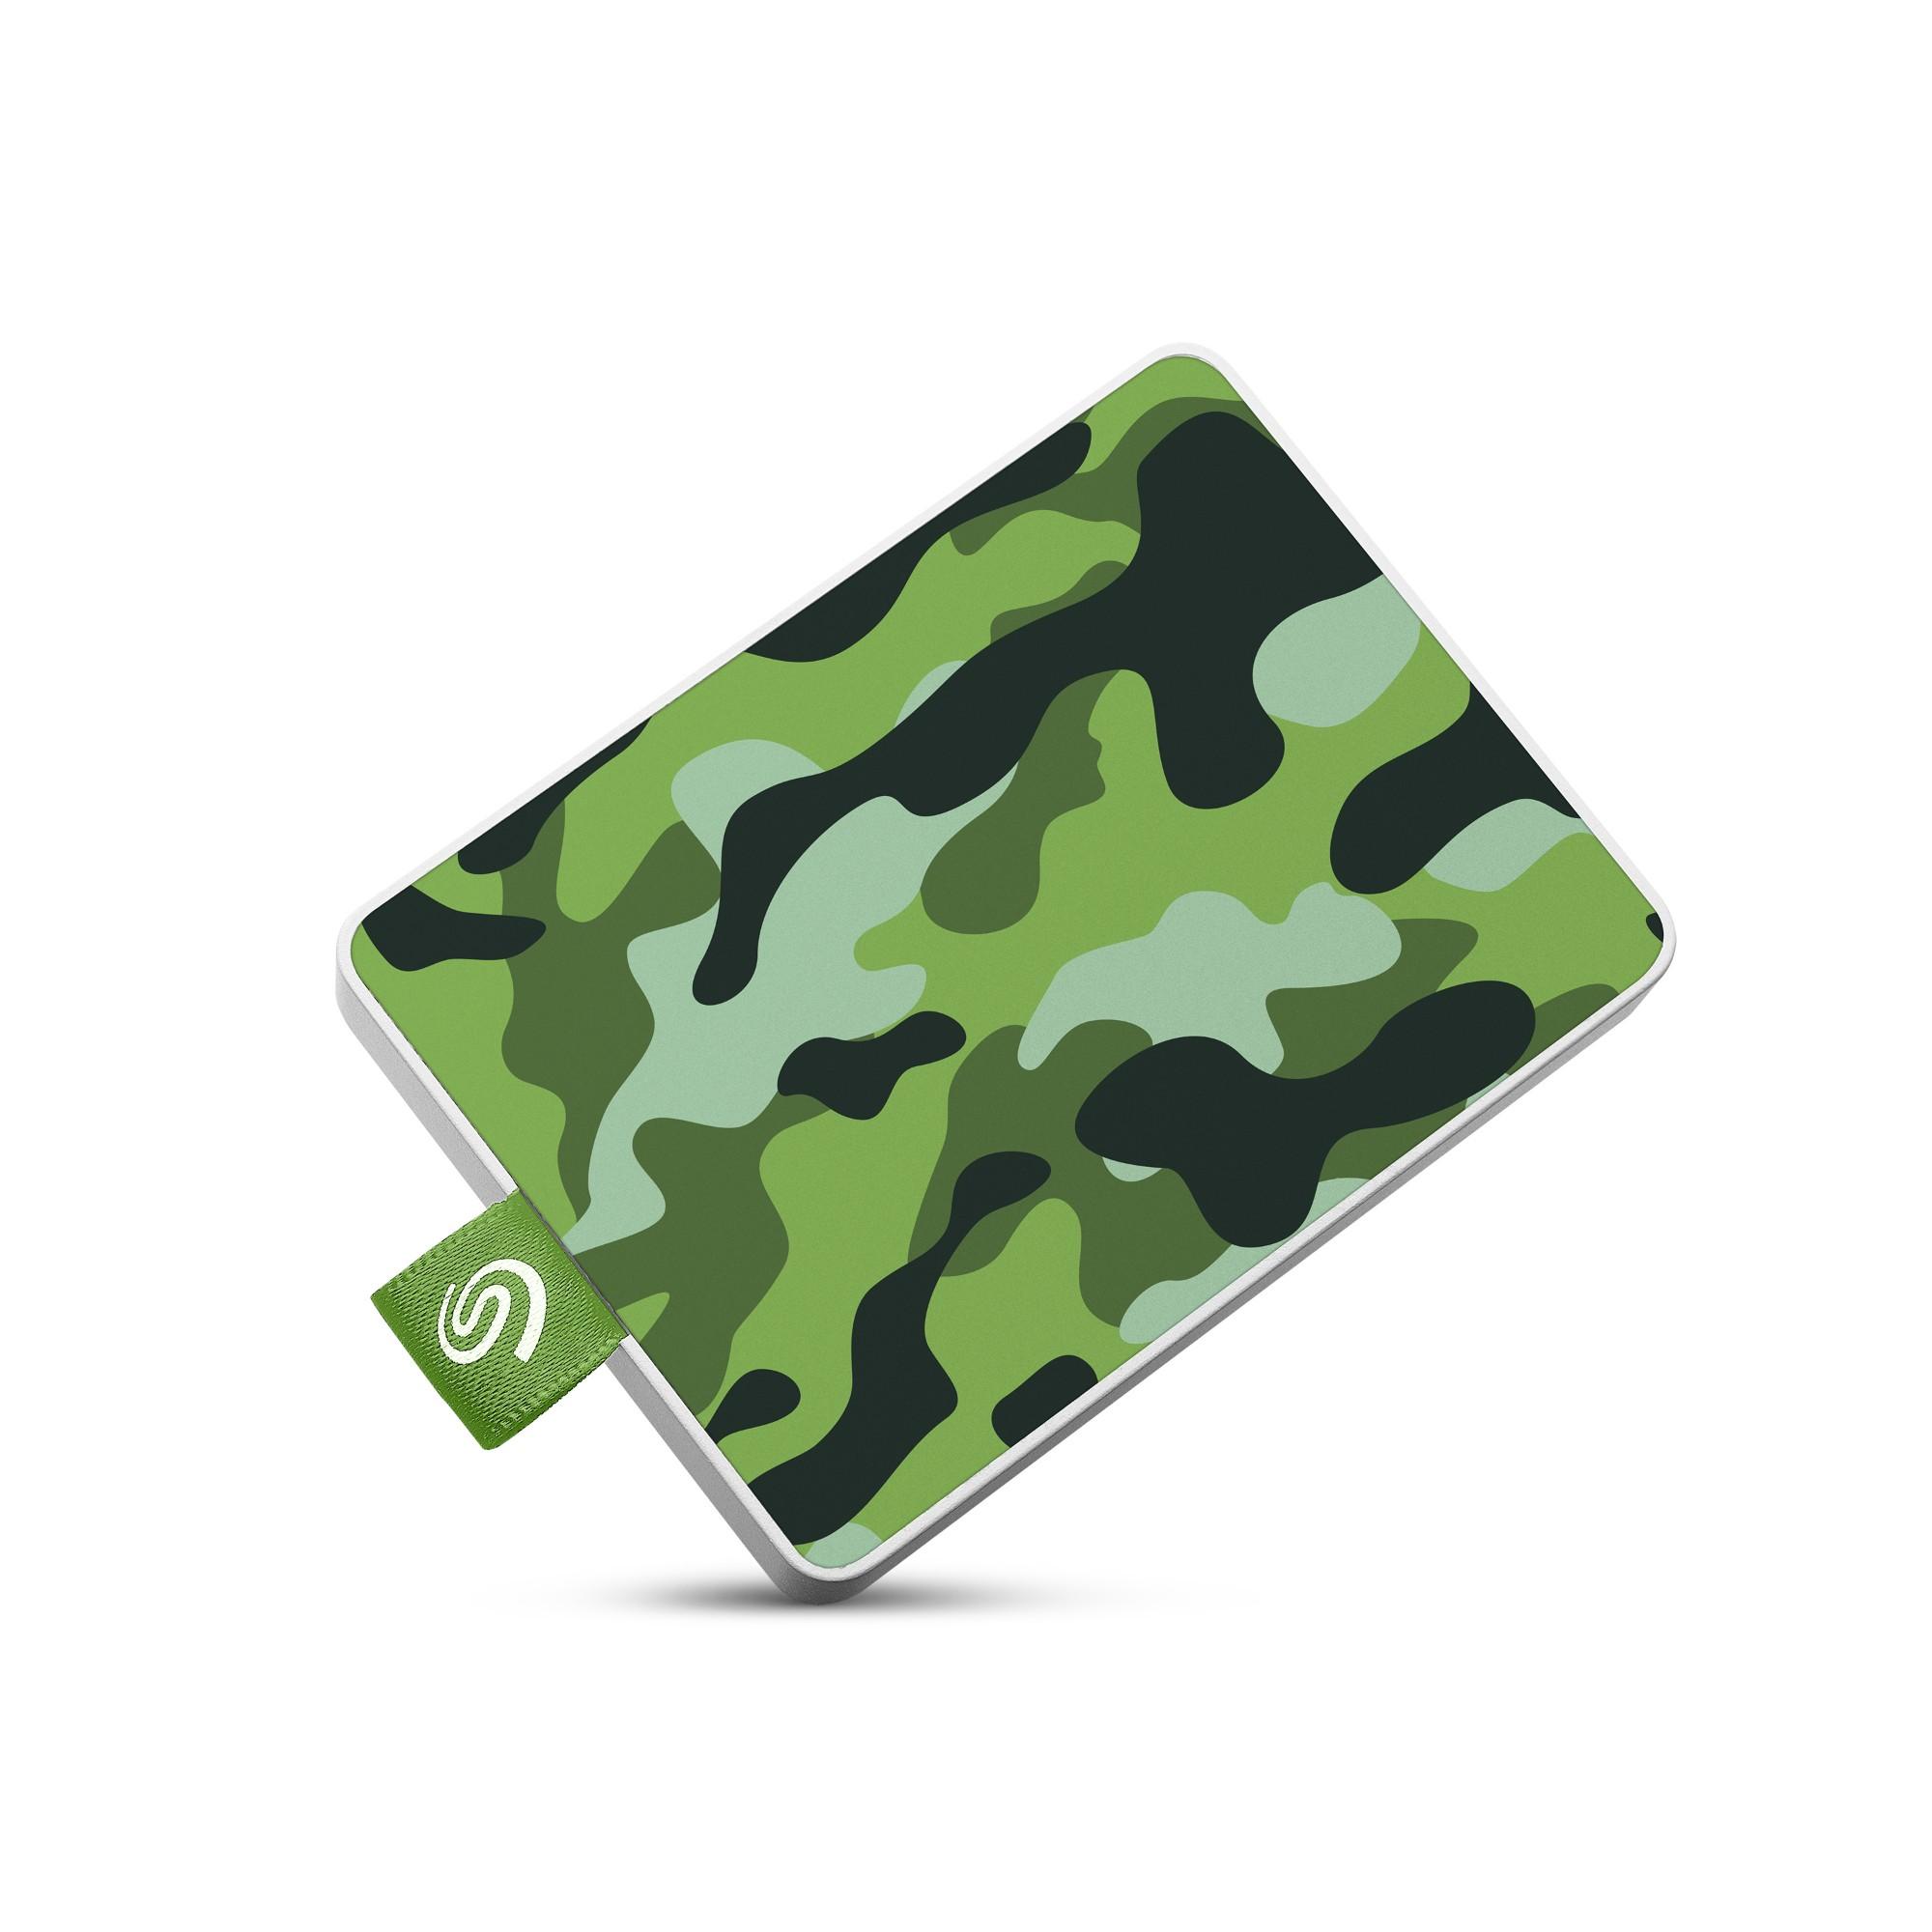 Seagate STJE500407 external hard drive 500 GB Camouflage,Green